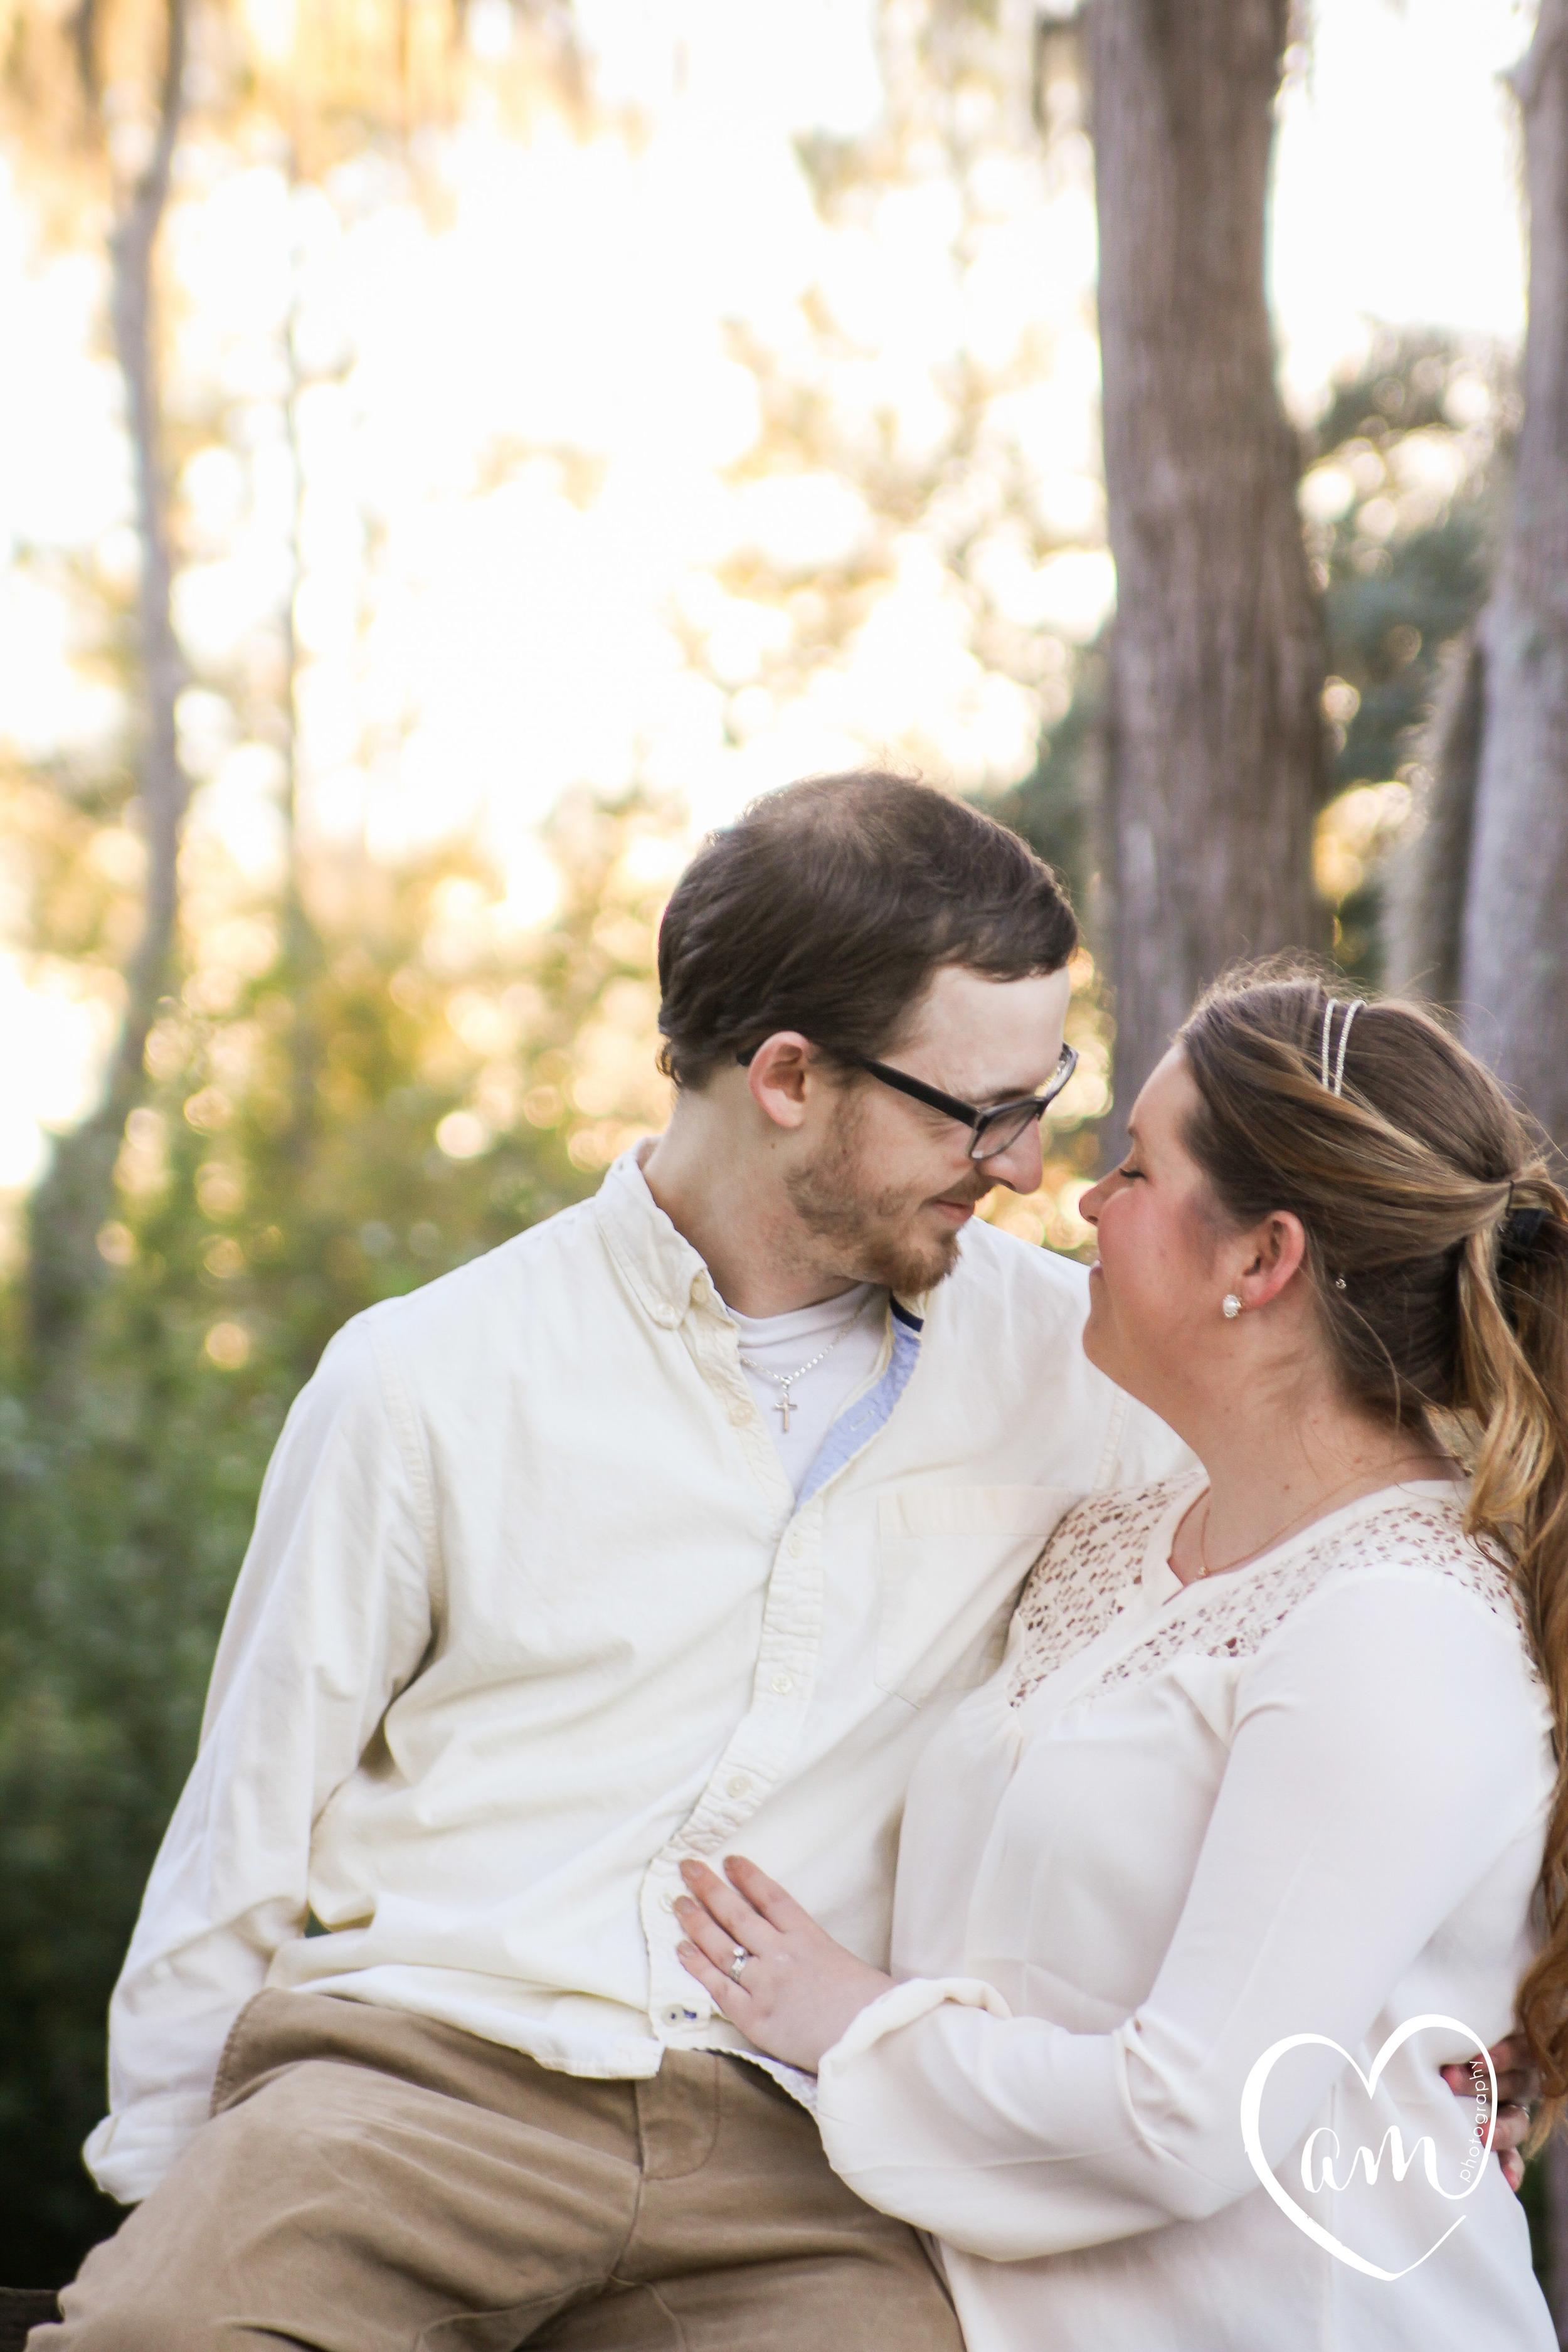 romantic engagement photos at shingle creek regional park in kissimmee